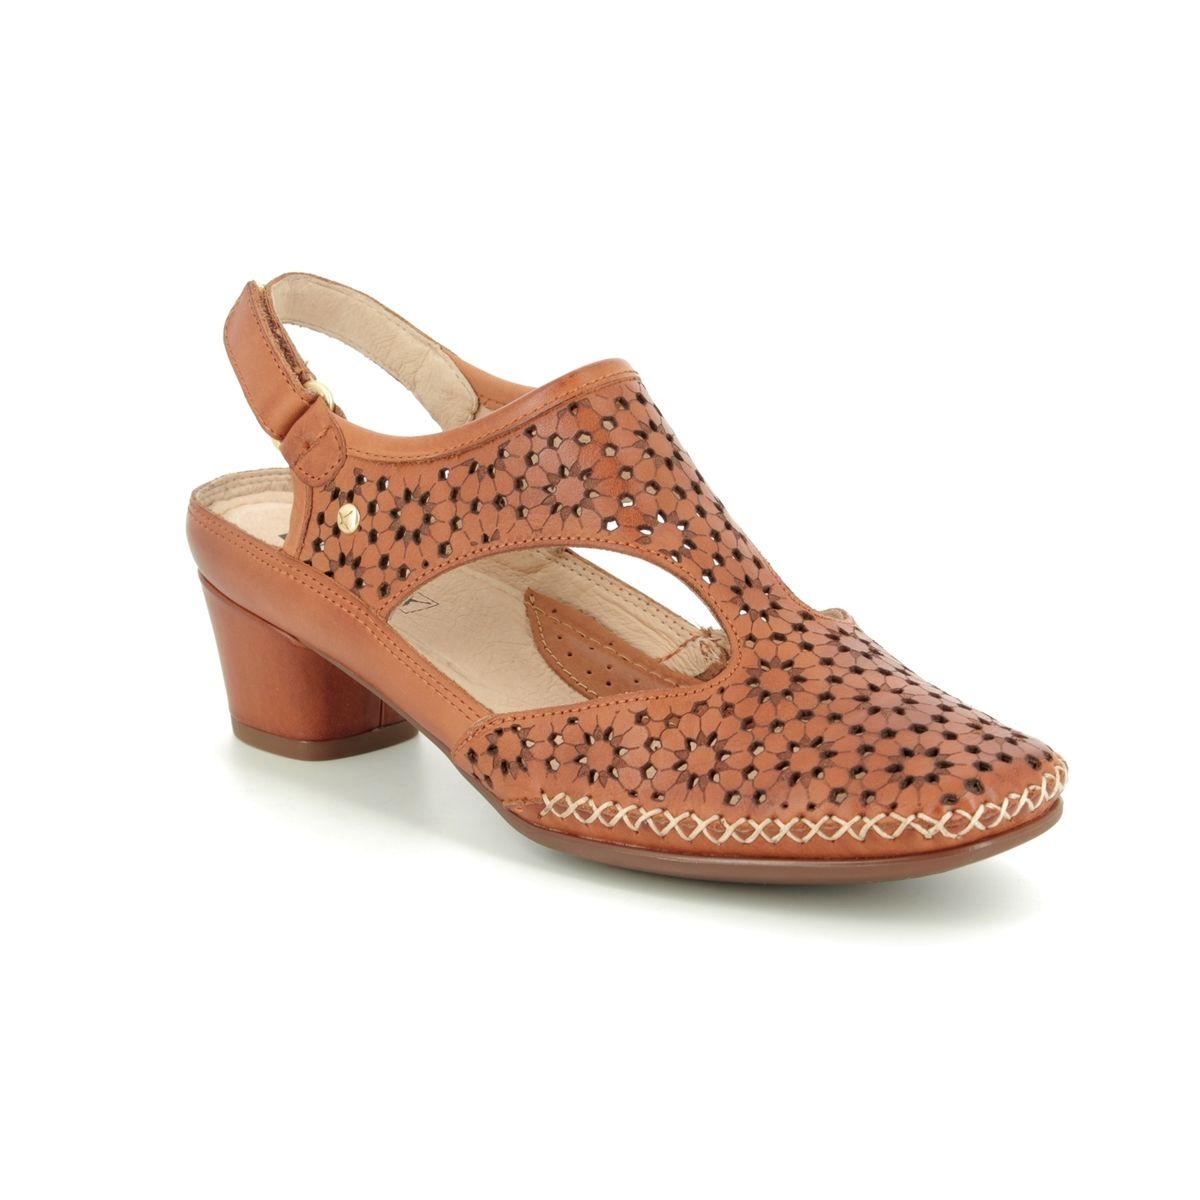 30fc6e06db2b2 Pikolinos Closed Toe Sandals - Tan Leather - W6R5873/11 GOMERA SINA